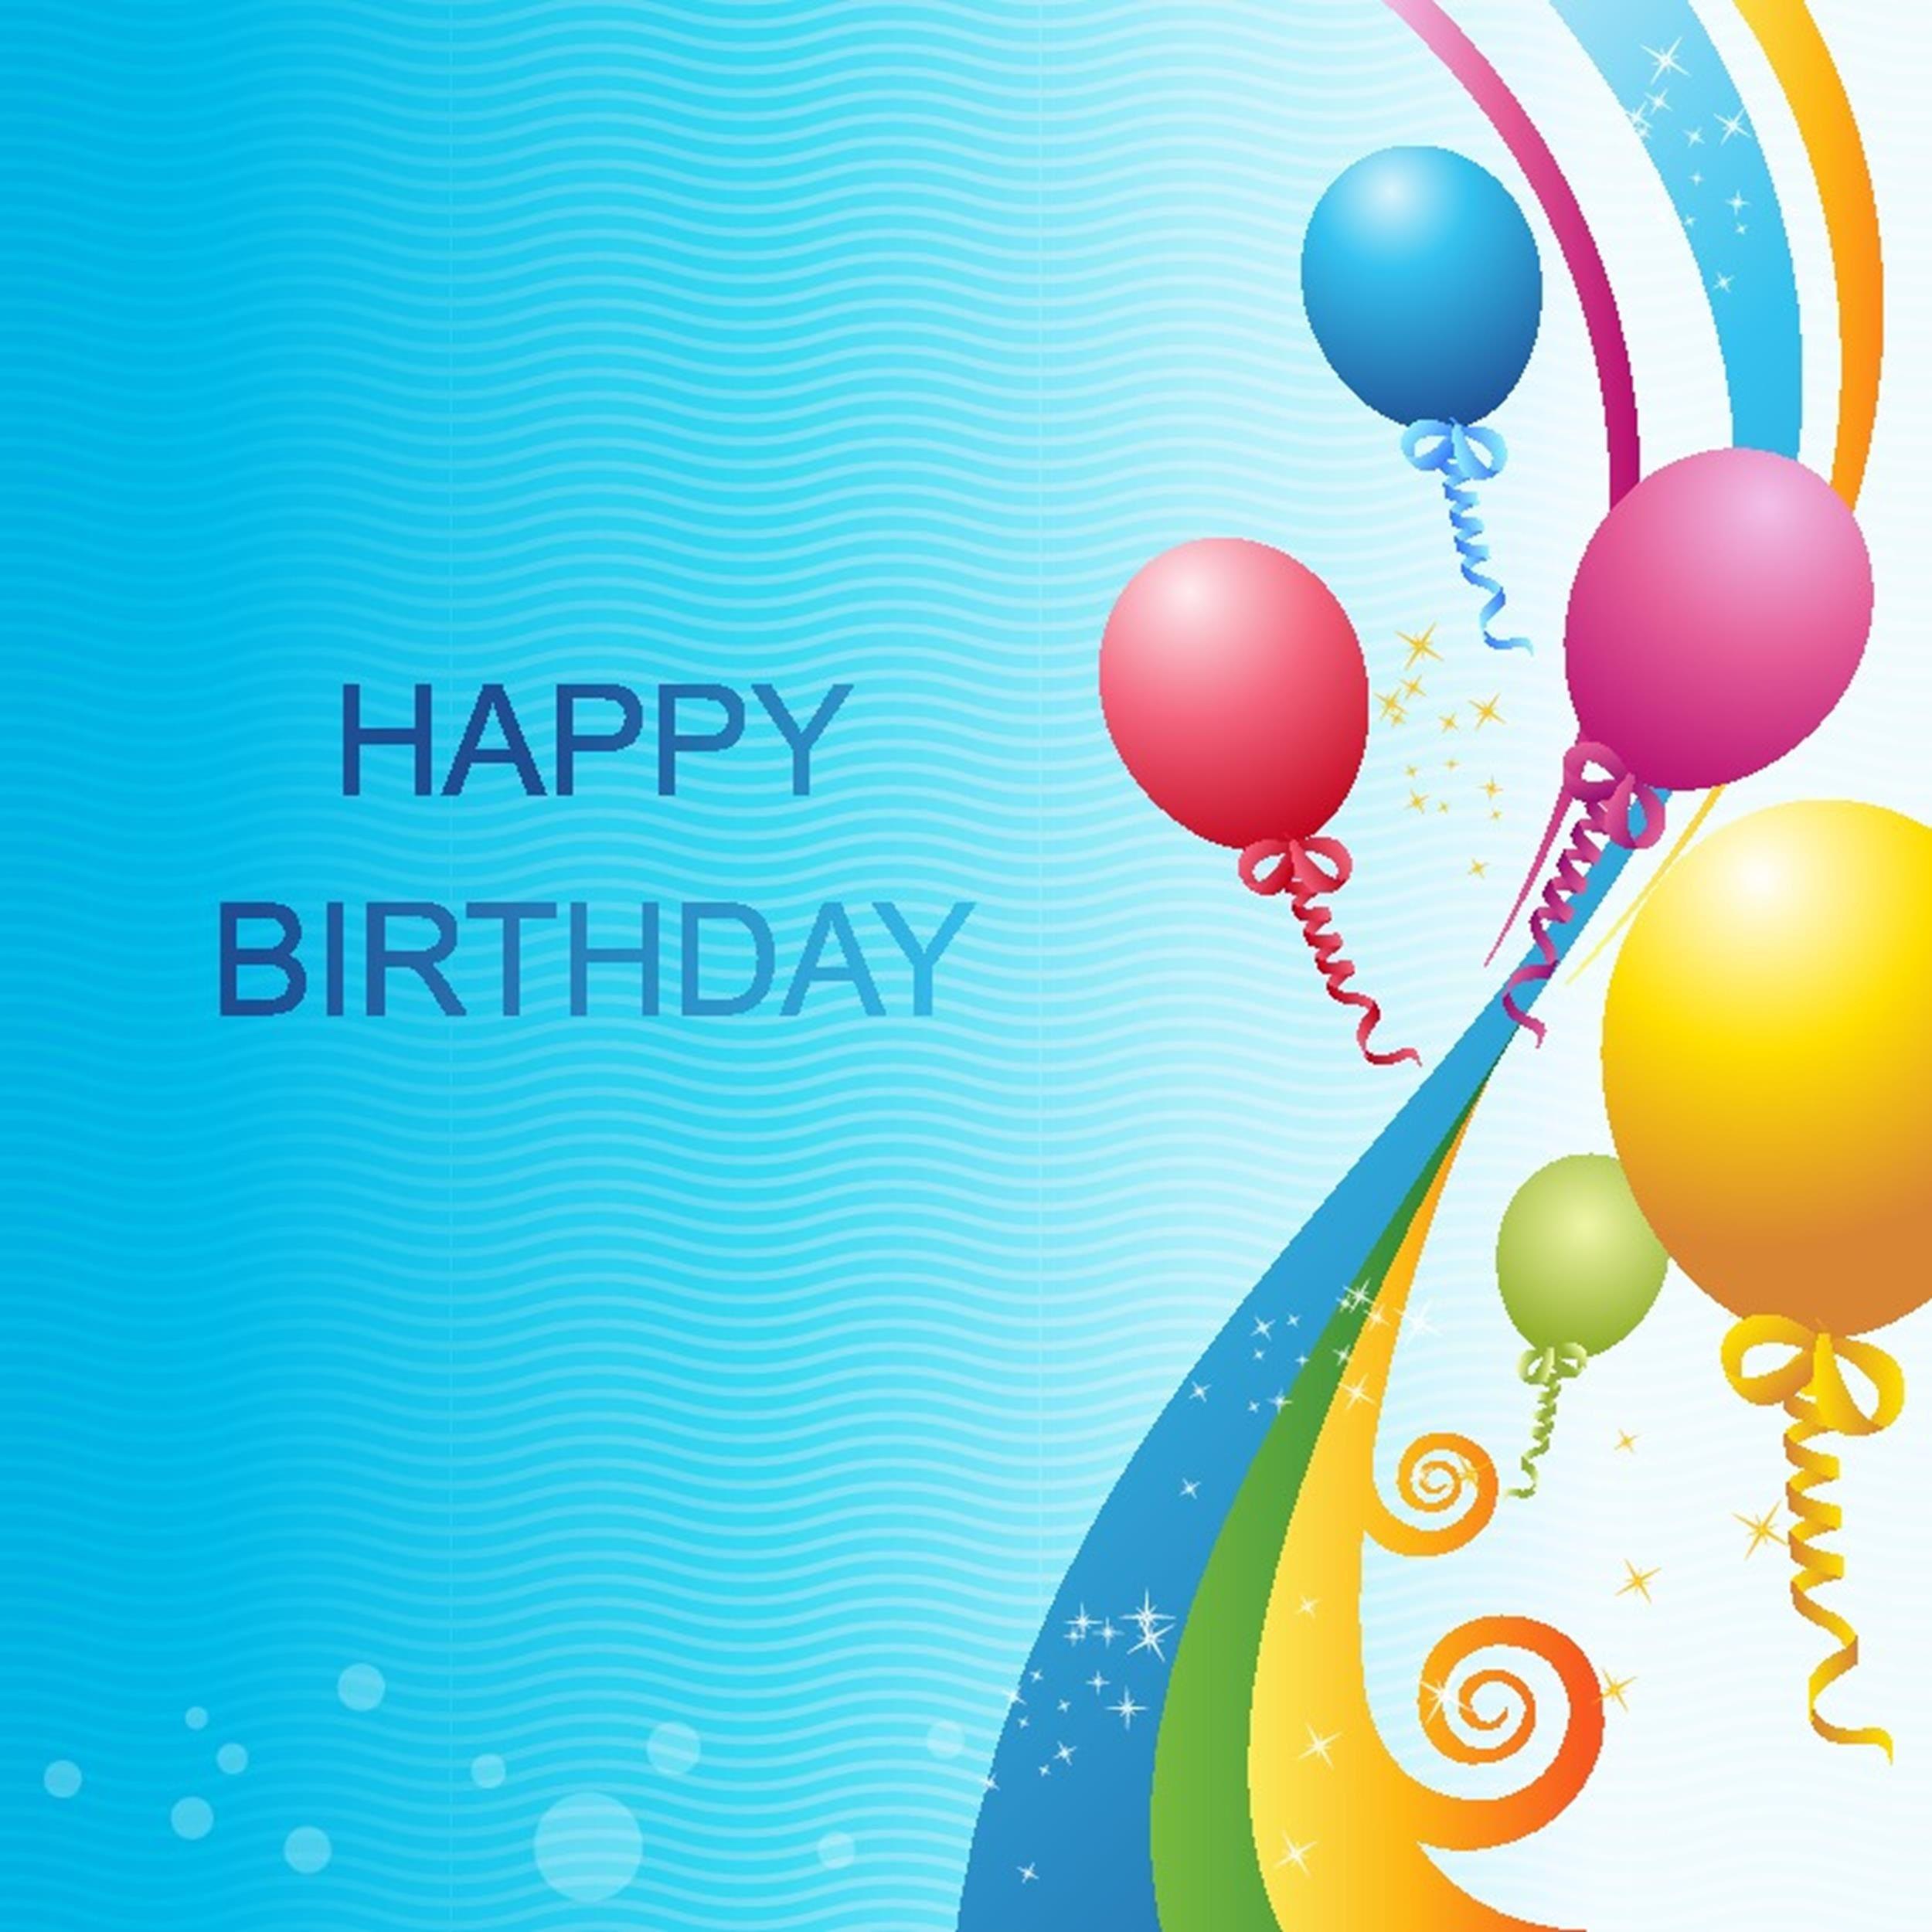 009 Sensational Free Printable Birthday Card Template For Mac High Def Full